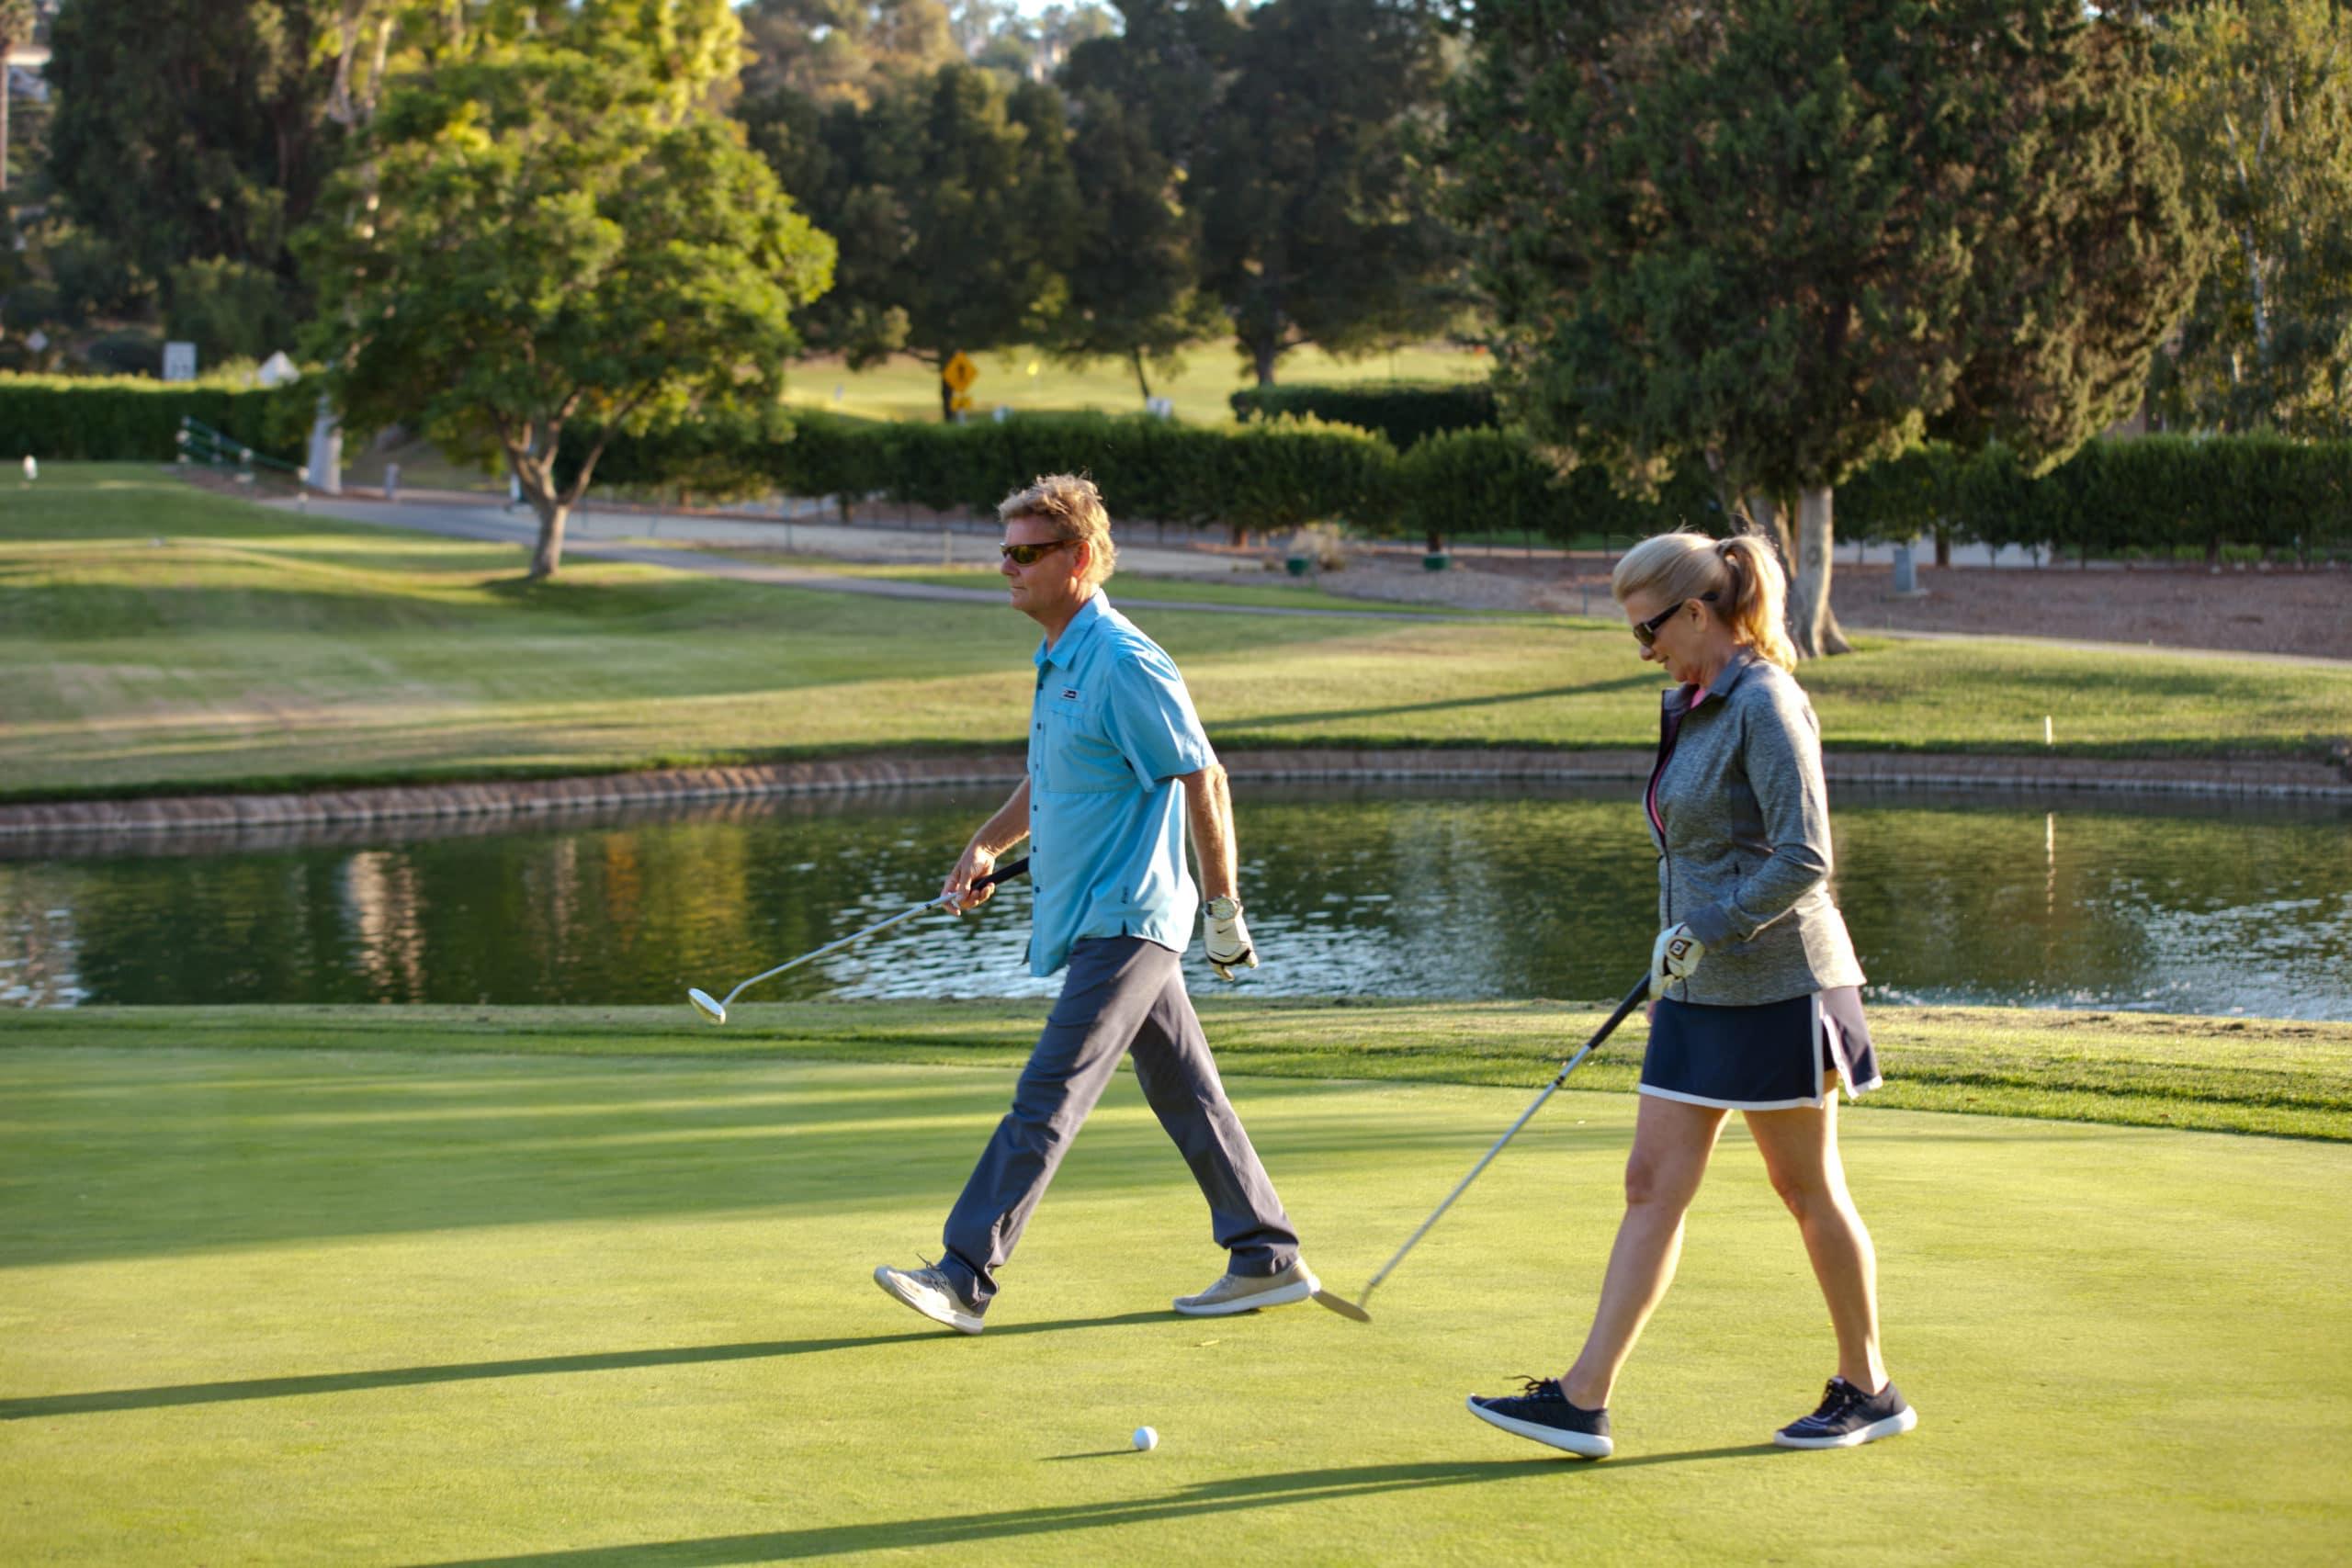 Camarillo_Golf_Golf_Landscape (4)